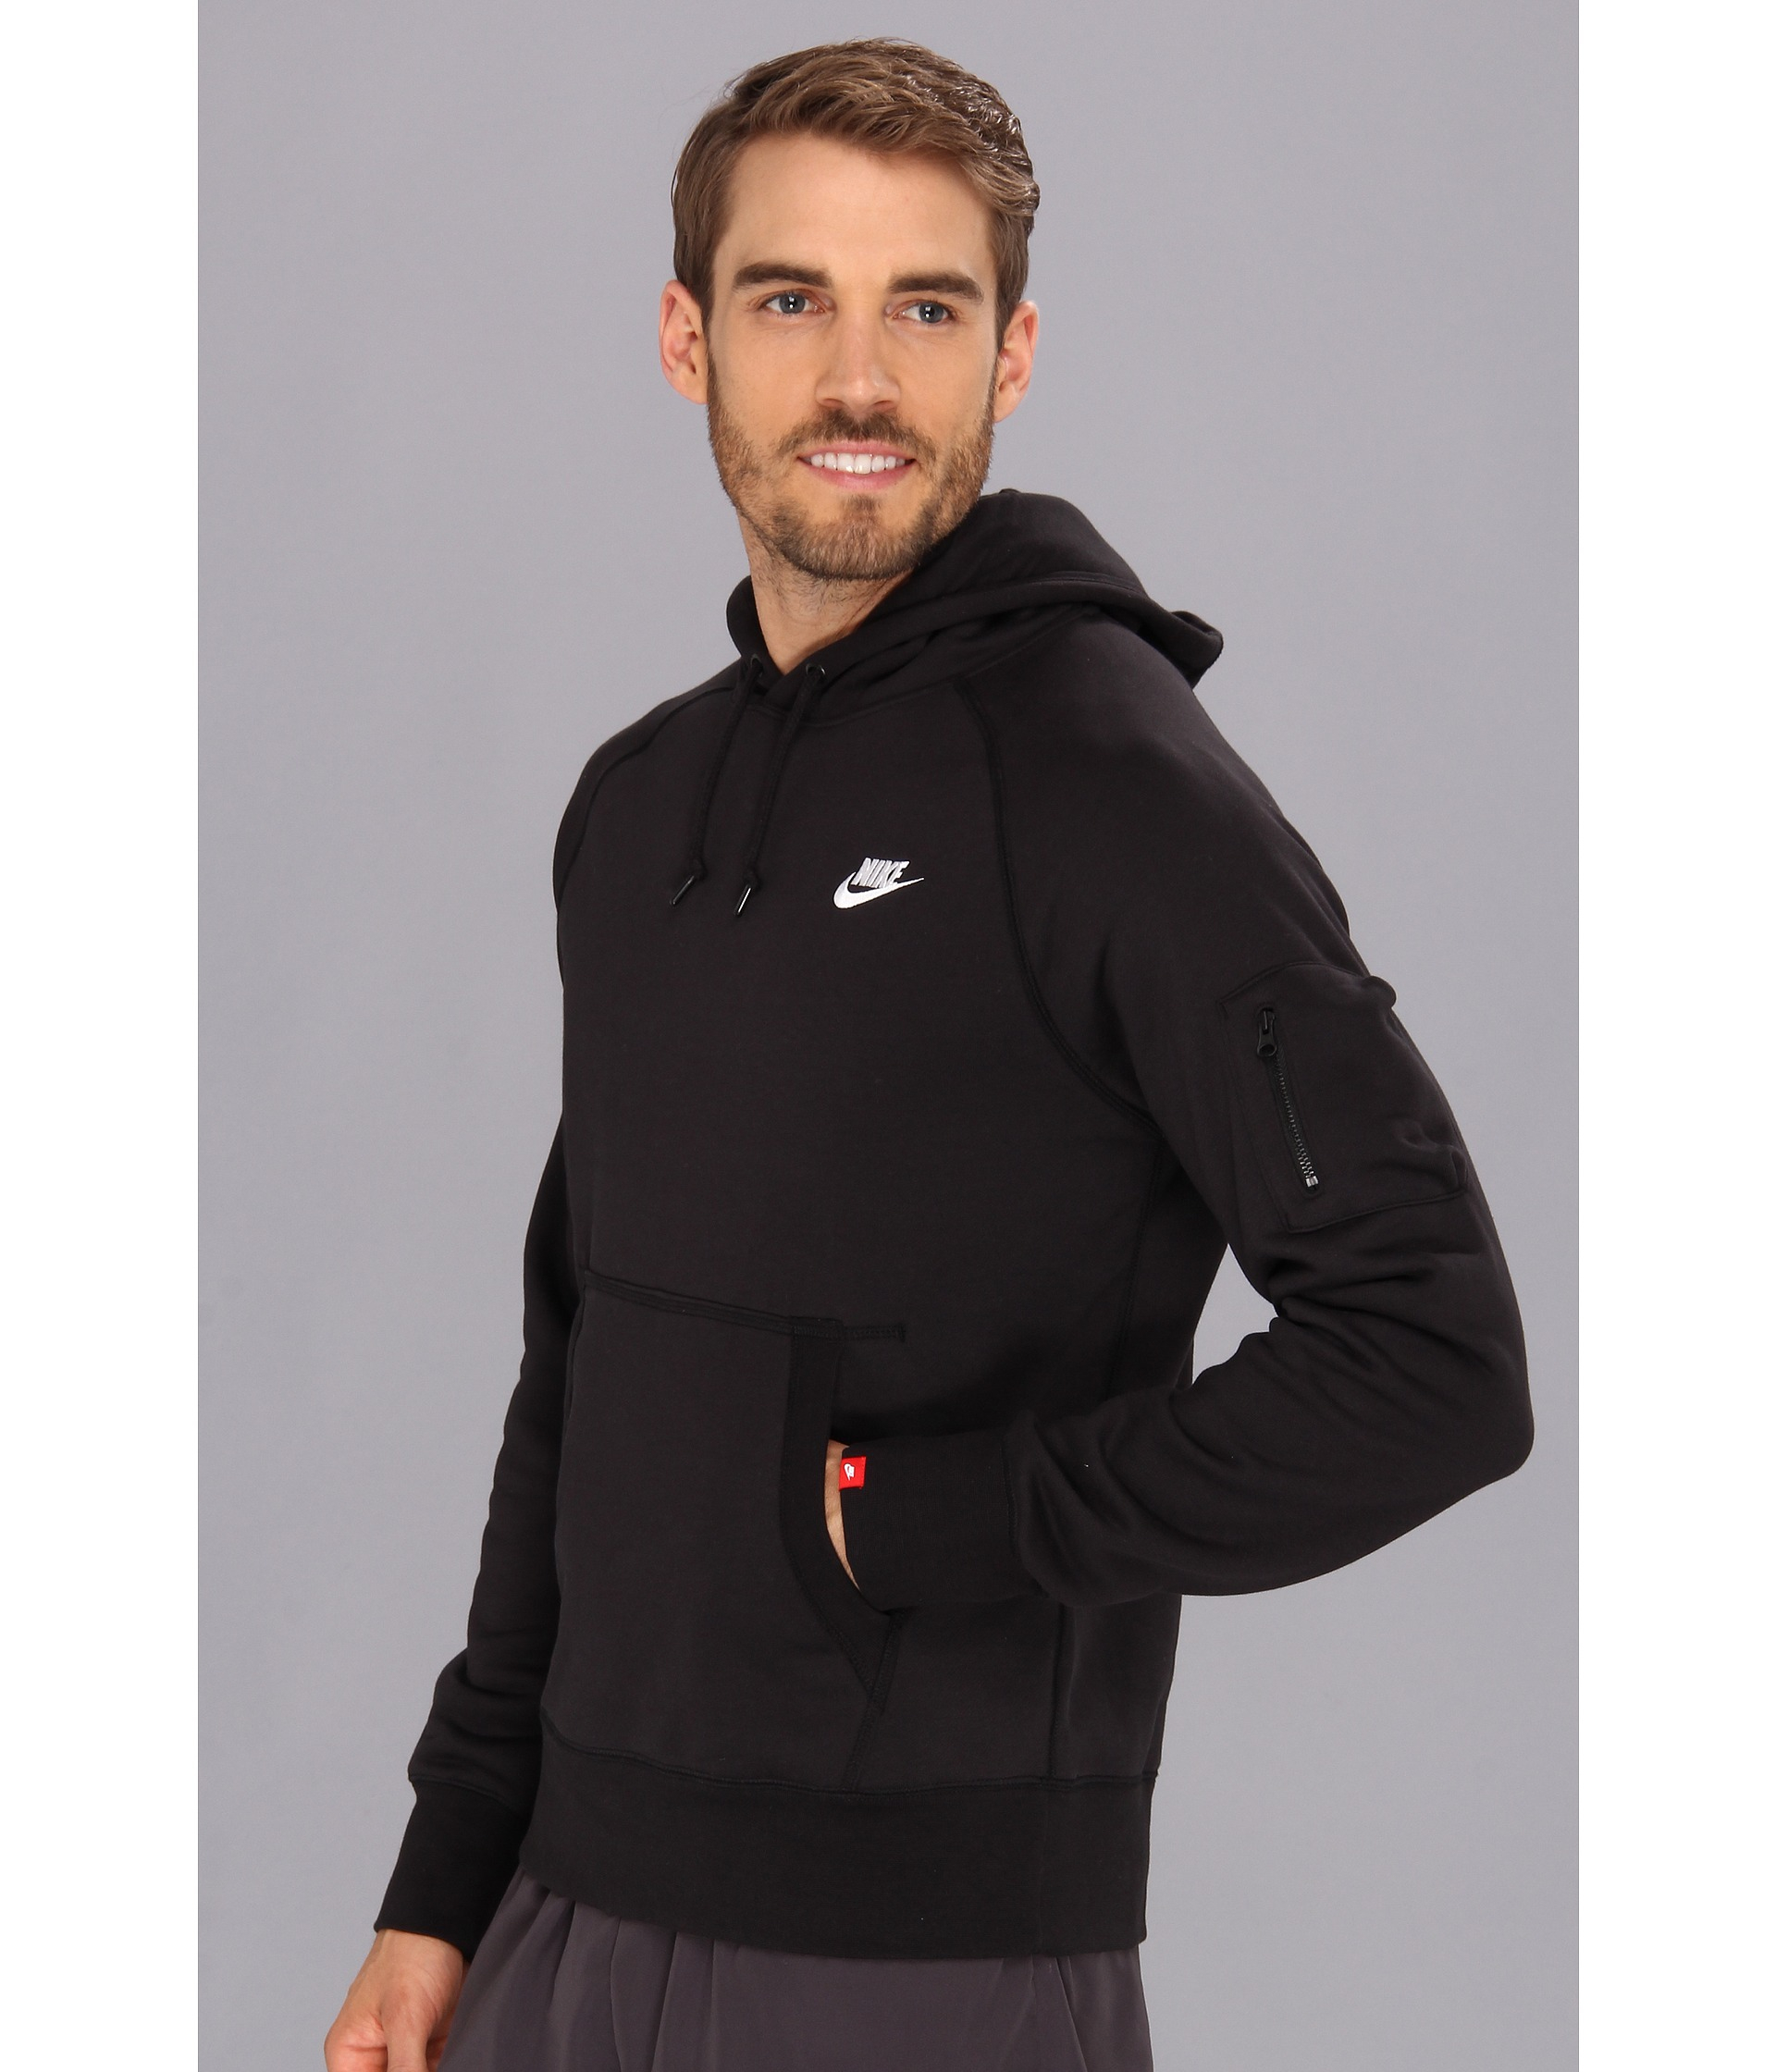 nike aw77 fleece pullover hoodie in black for men lyst. Black Bedroom Furniture Sets. Home Design Ideas